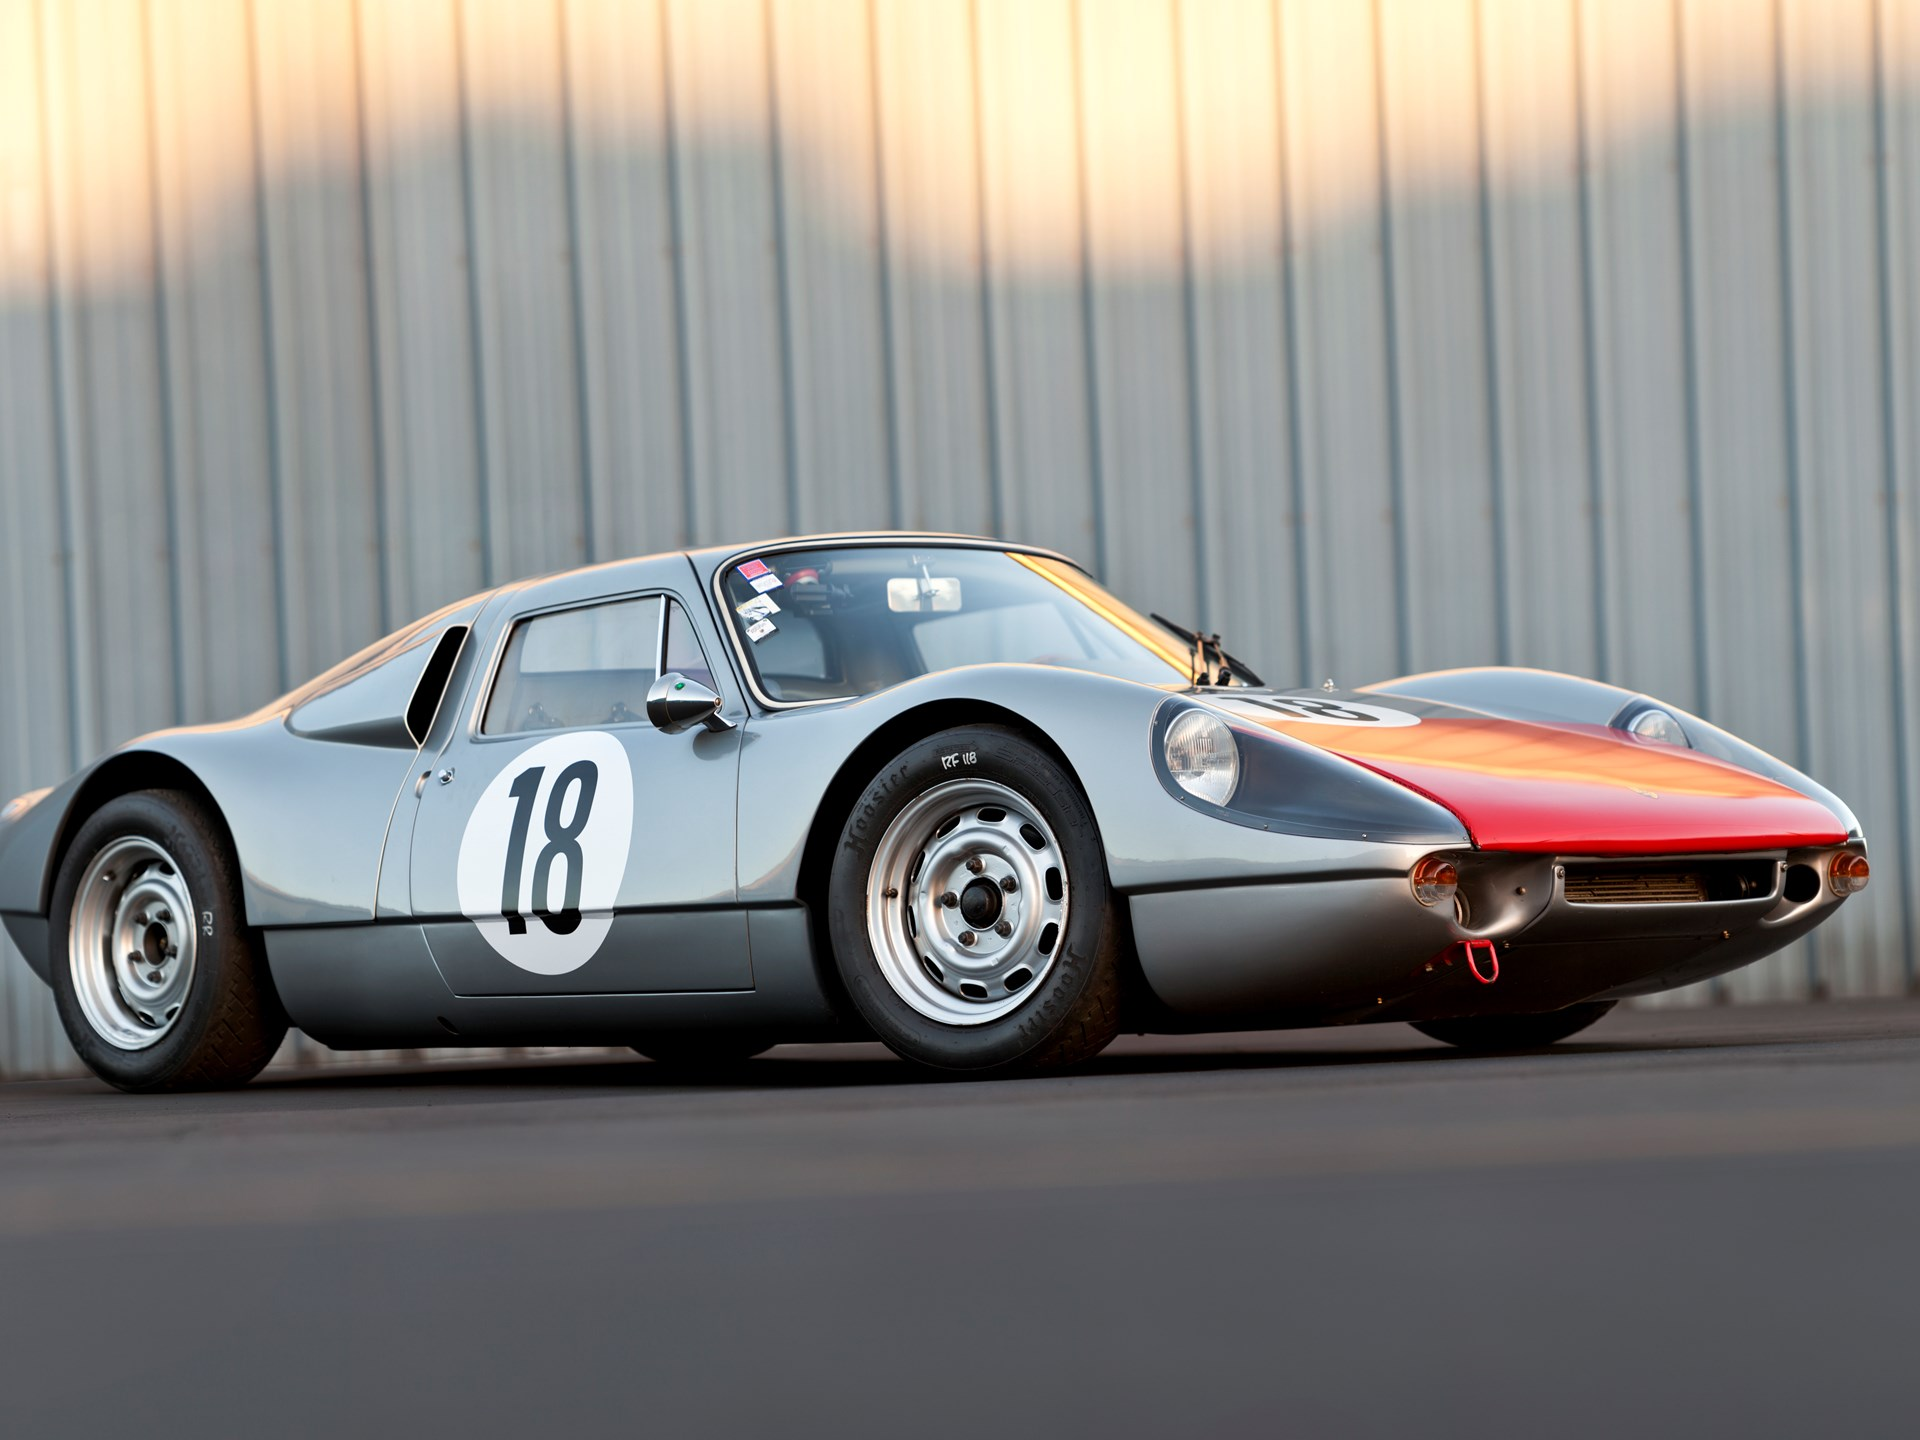 1963 Porsche 904/6 Carrera GTS Factory Works Protoype